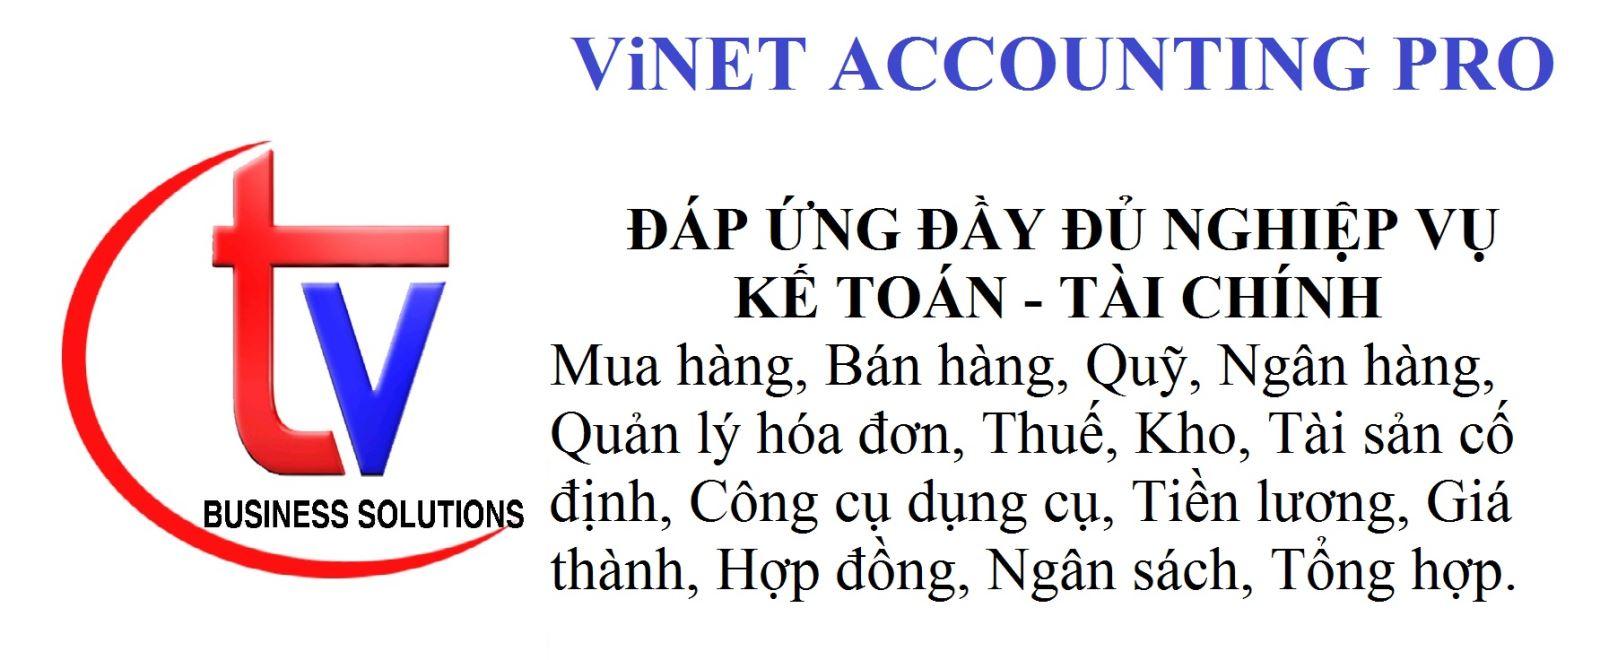 ViNET ACCOUNTING PRO